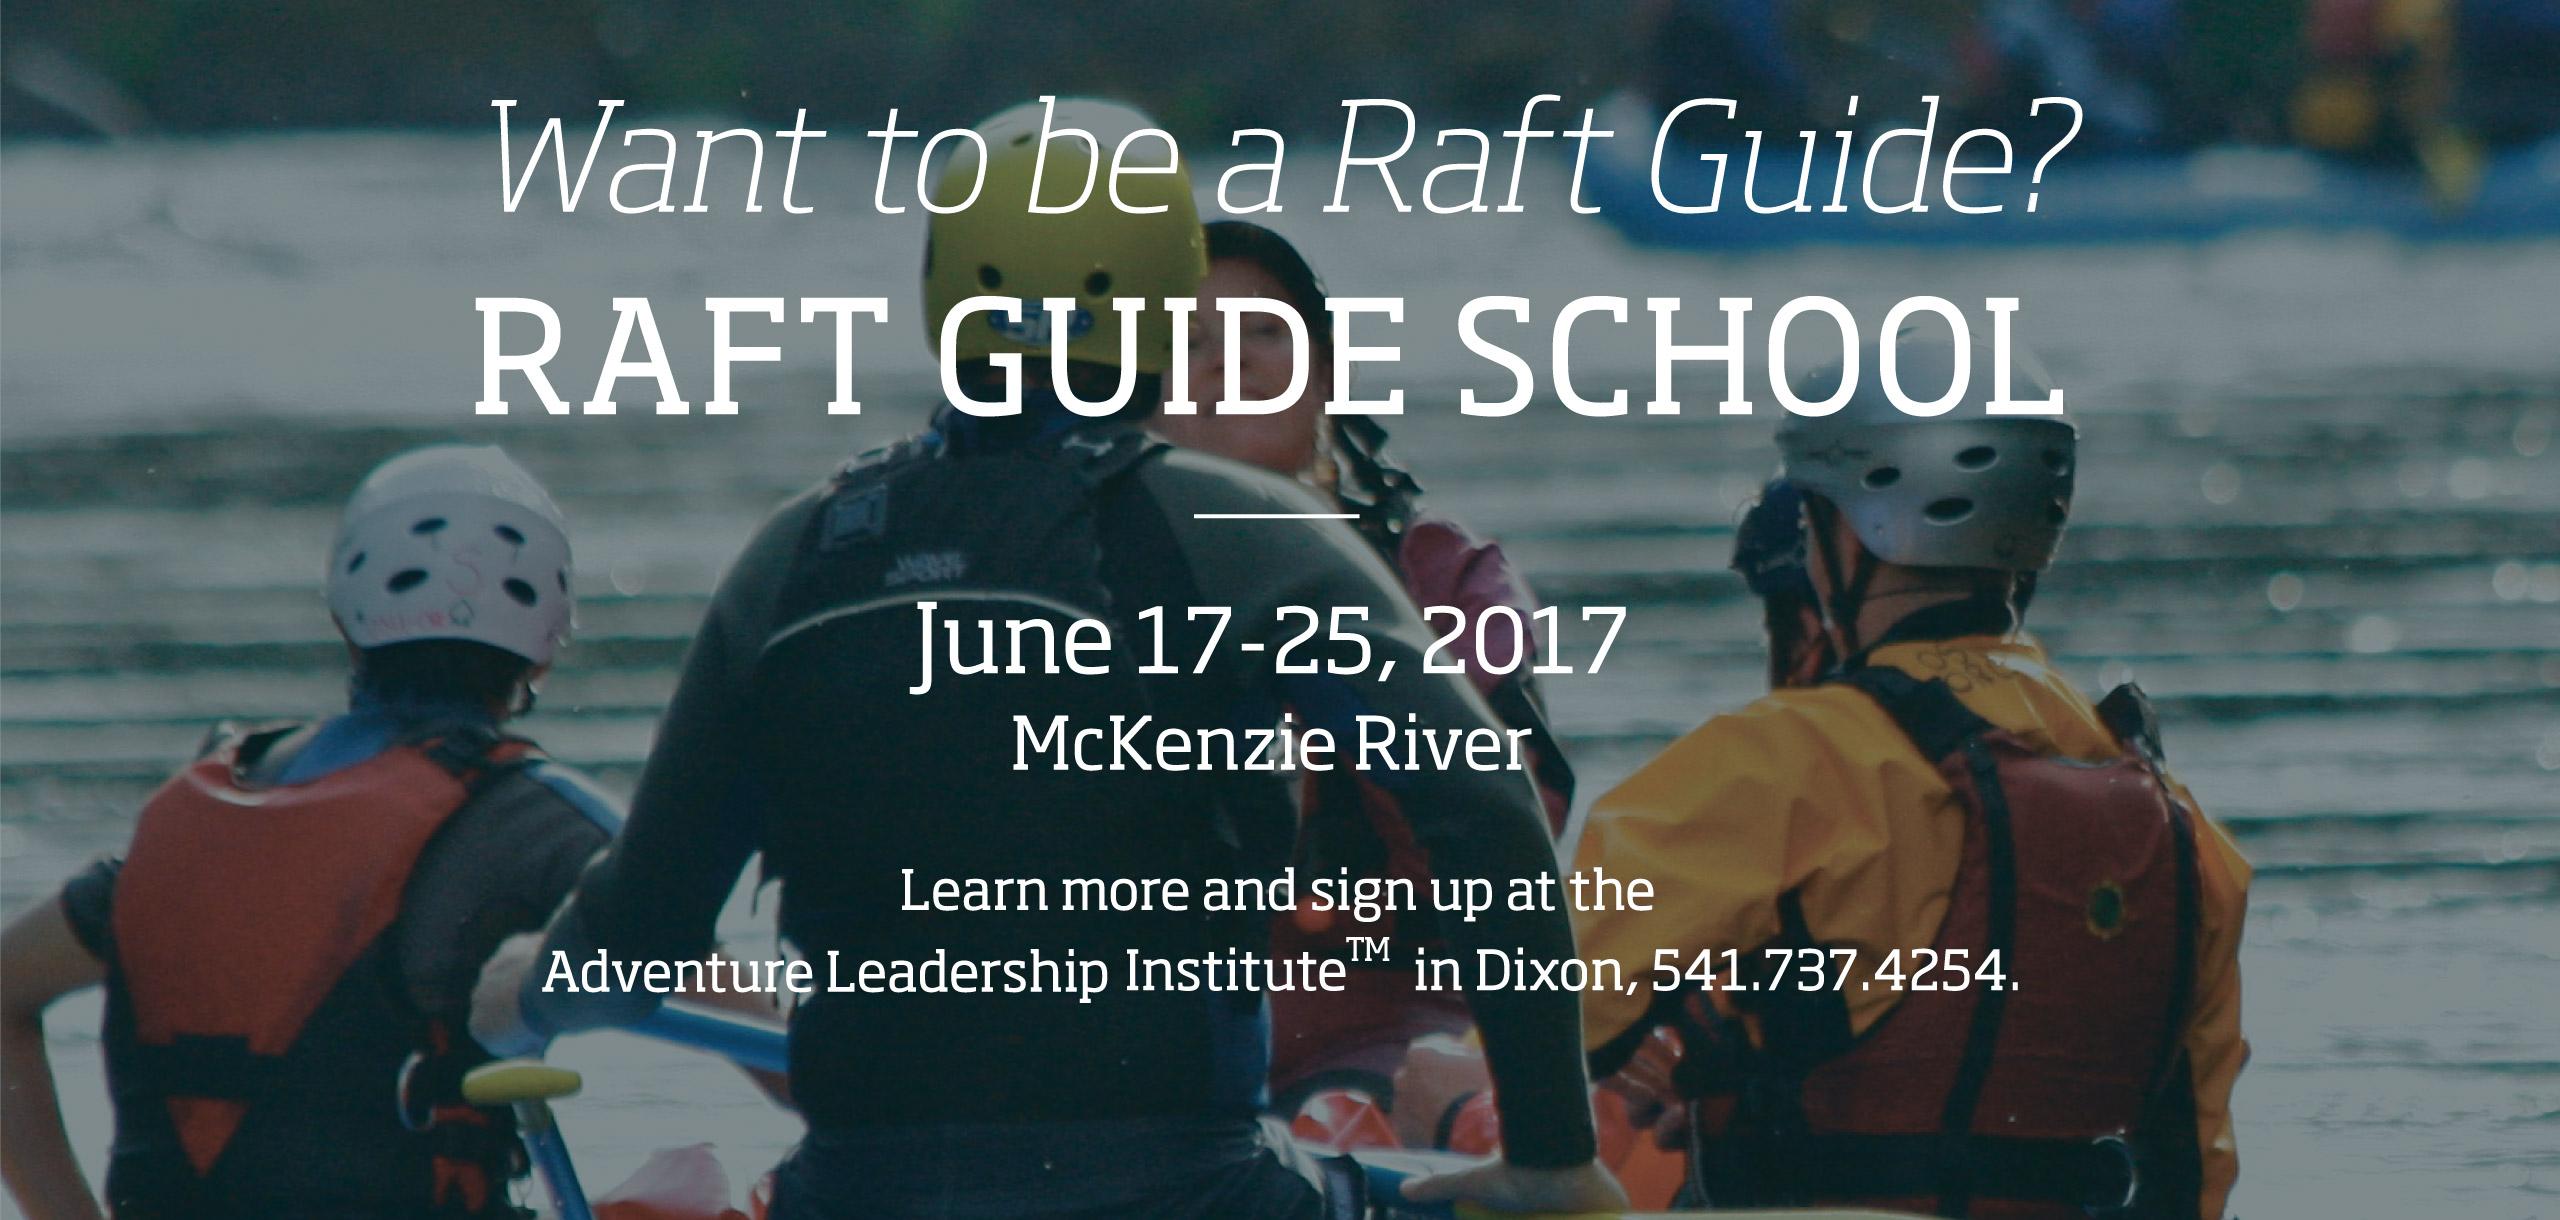 Raft Guide School